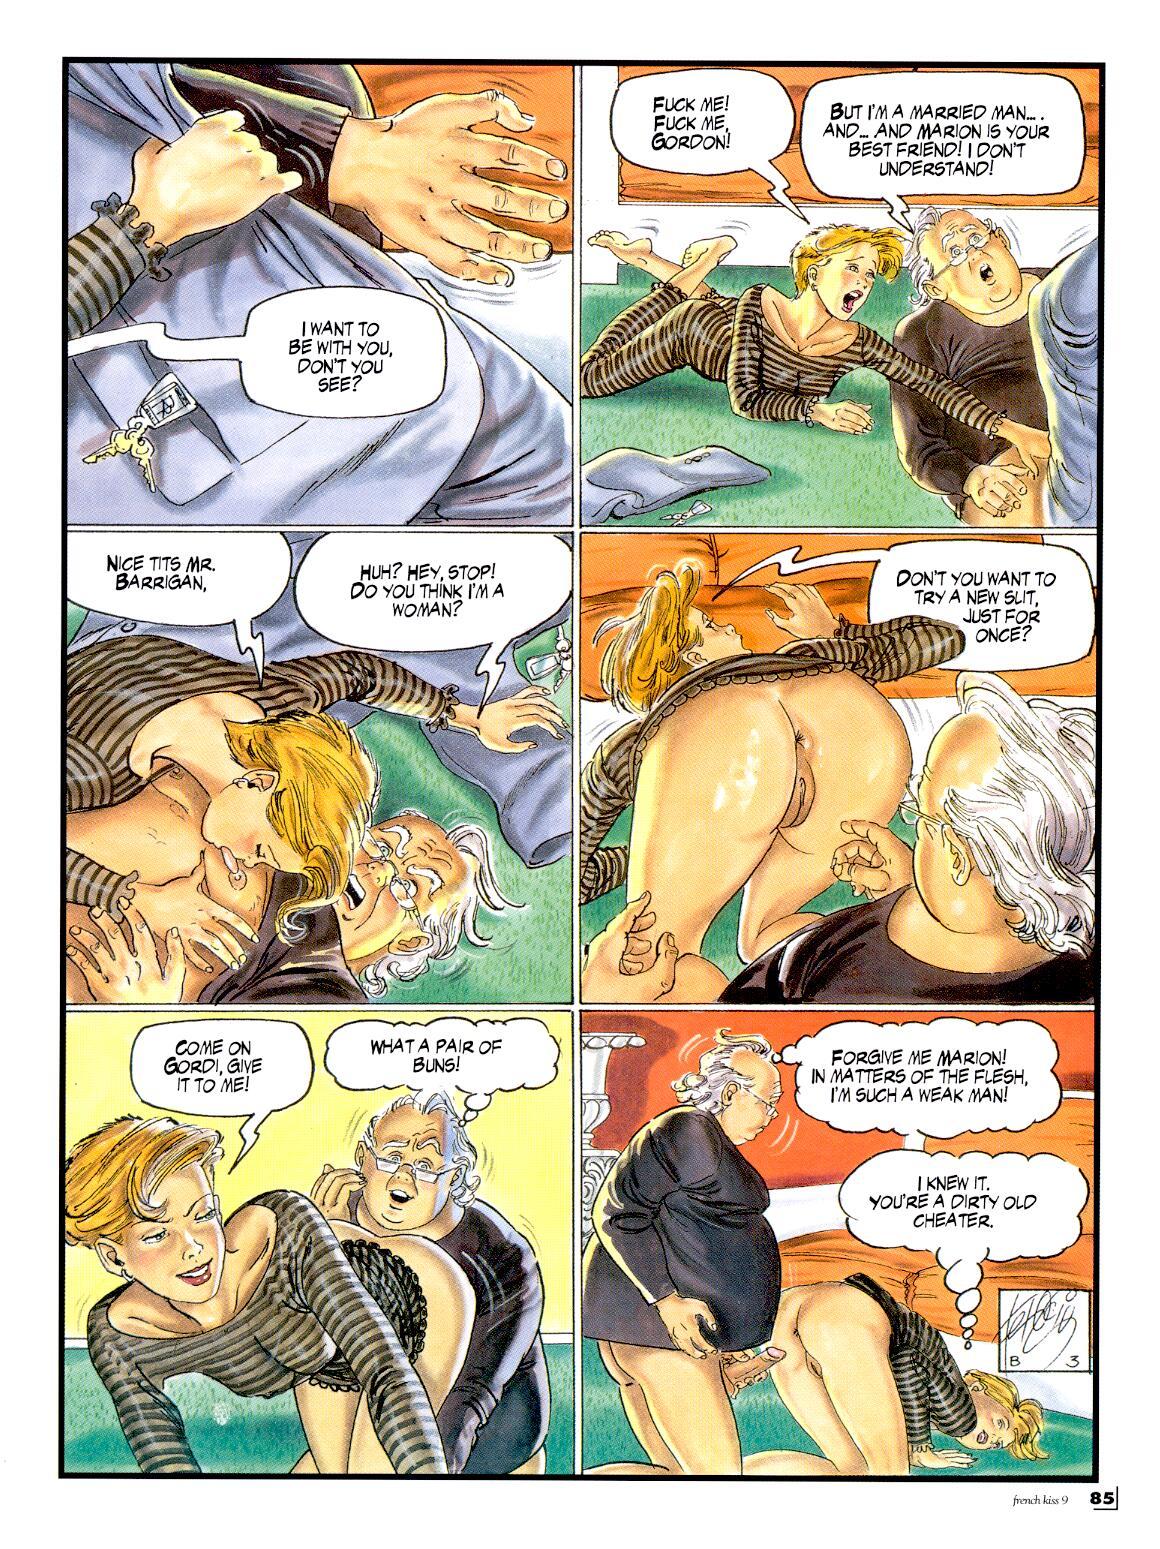 English sex comic strips